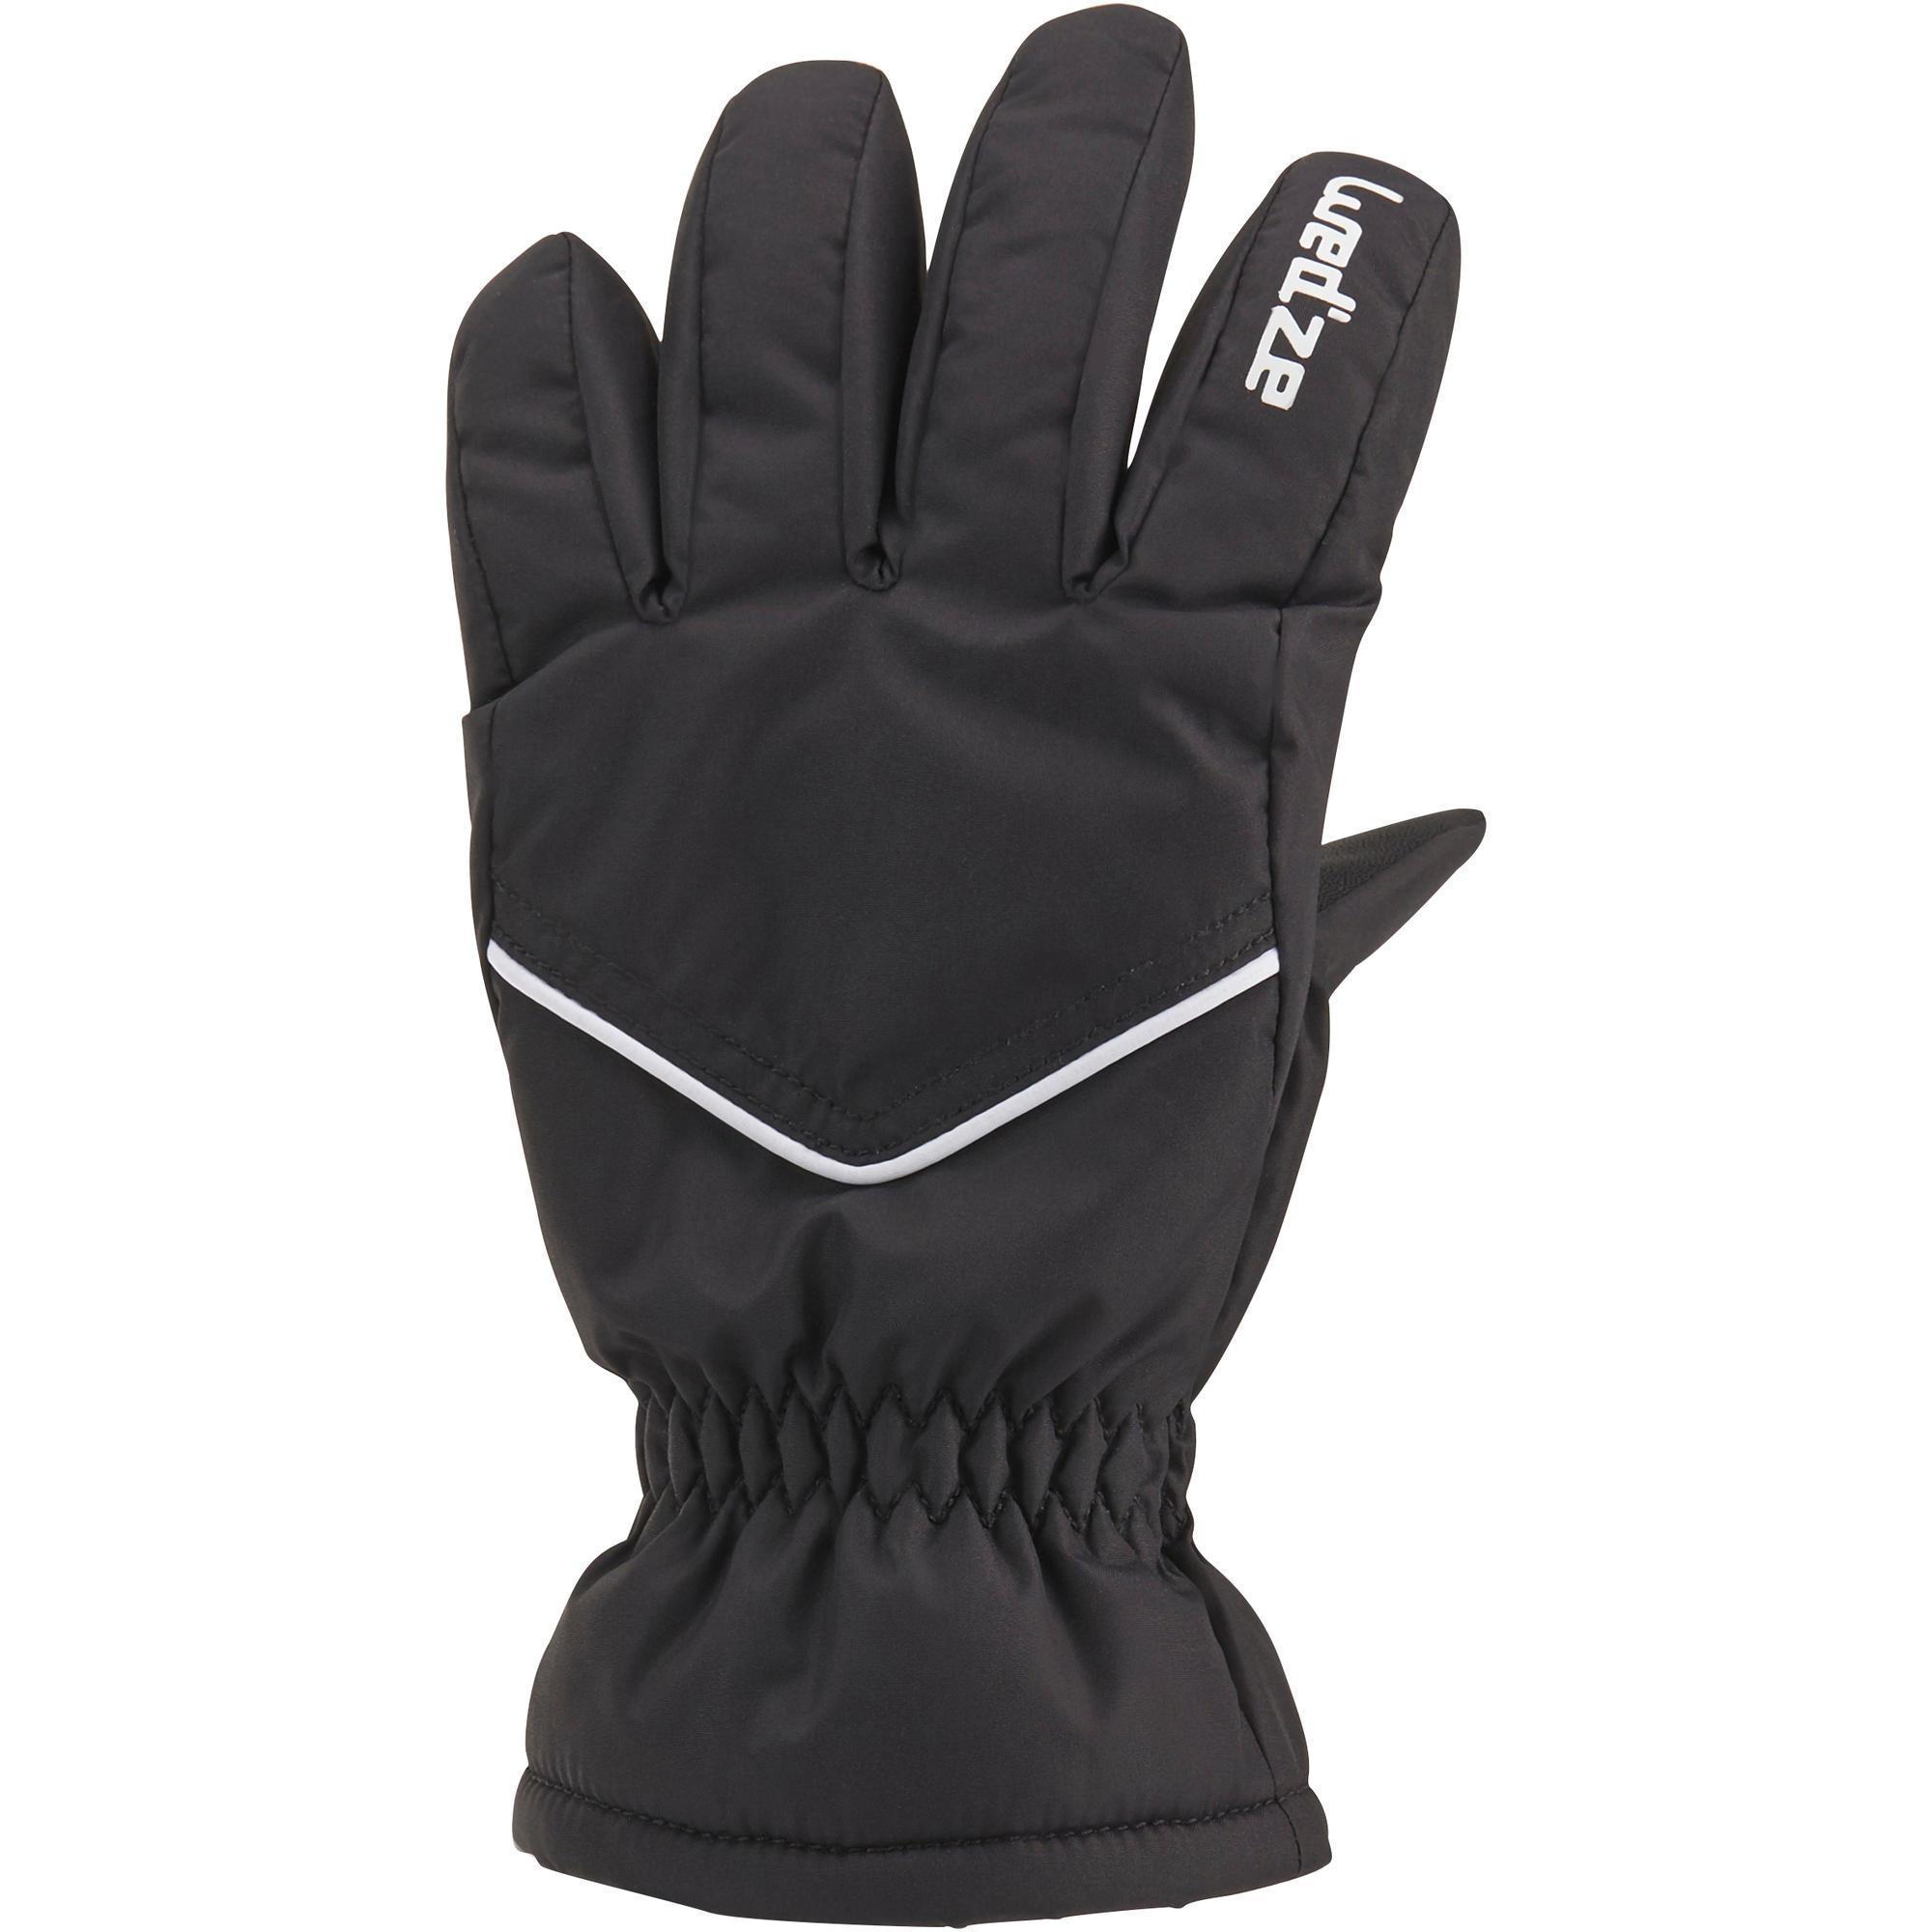 Handschuhe Slide 100 Kinder schwarz